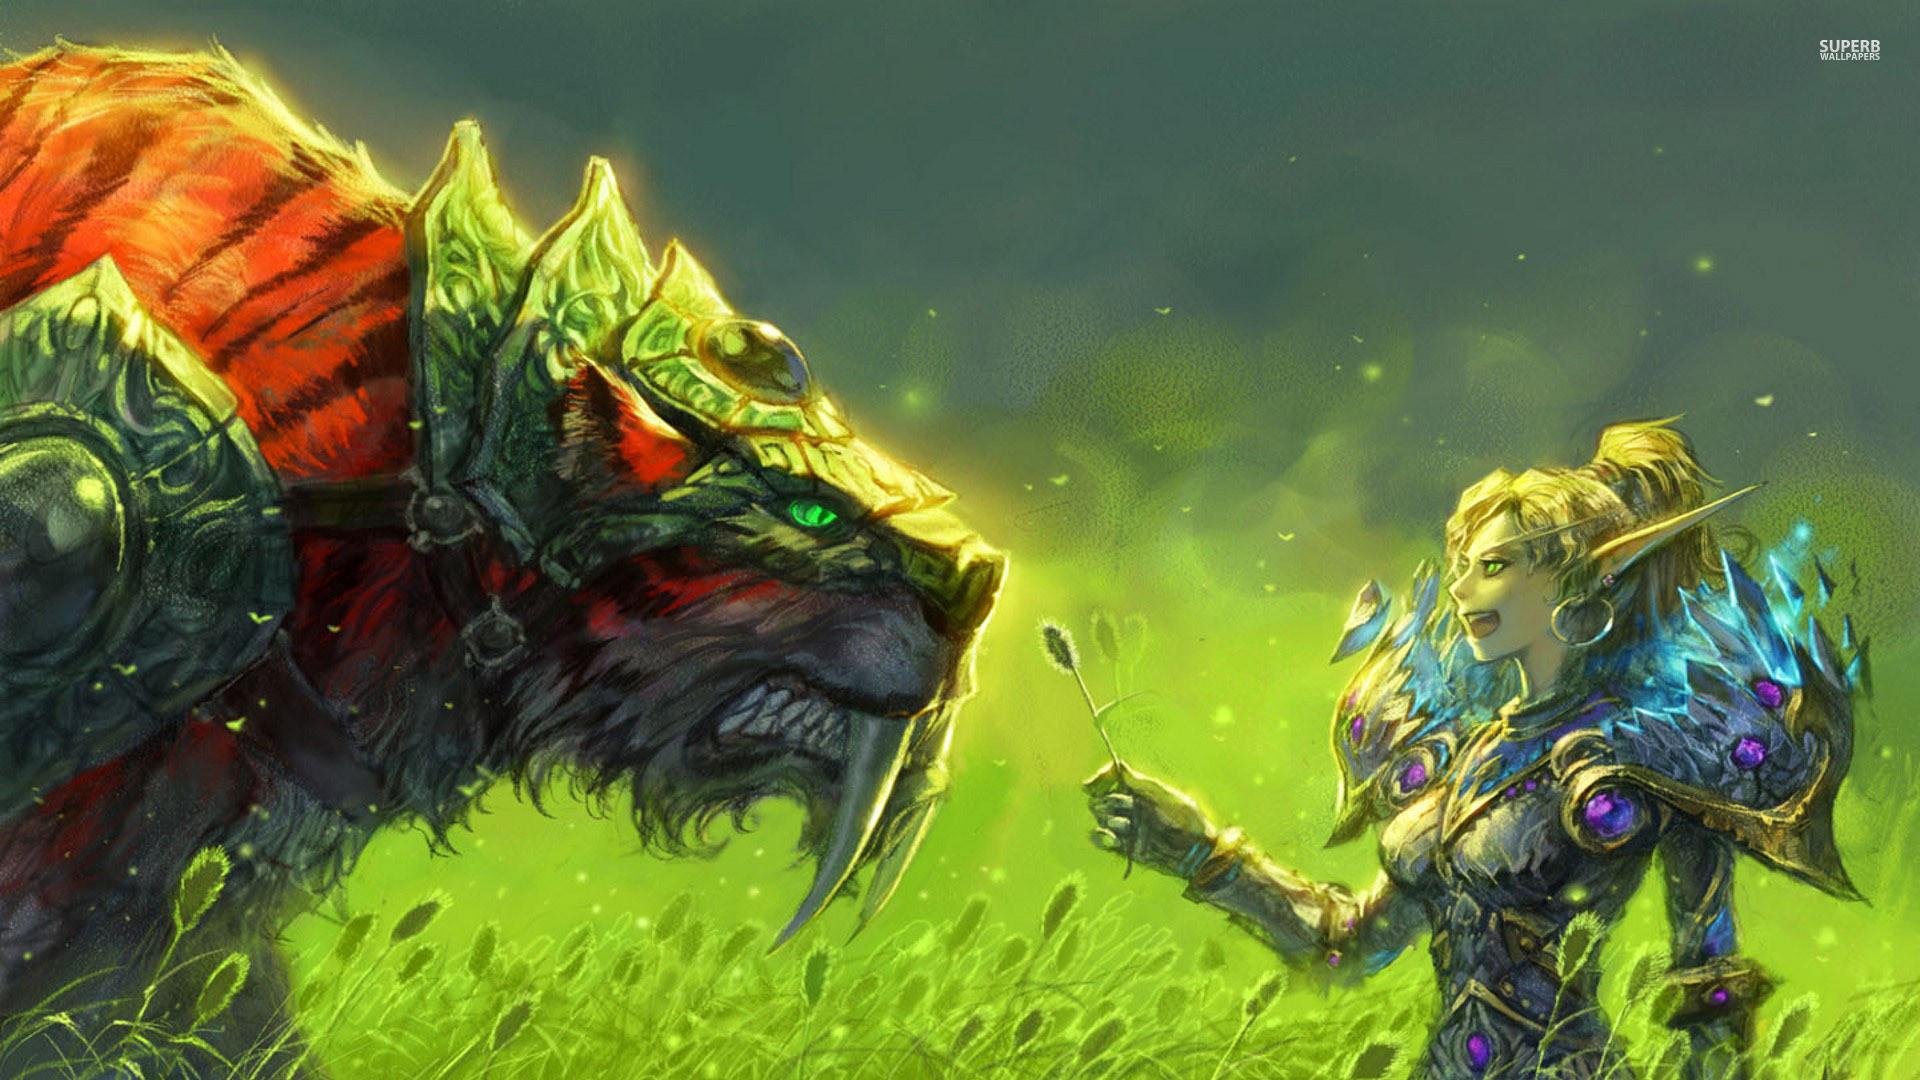 World of Warcraft | World of Warcraft wow desktop Full HD Wallpapers and  Desktop Backgrounds HD Images | Pinterest